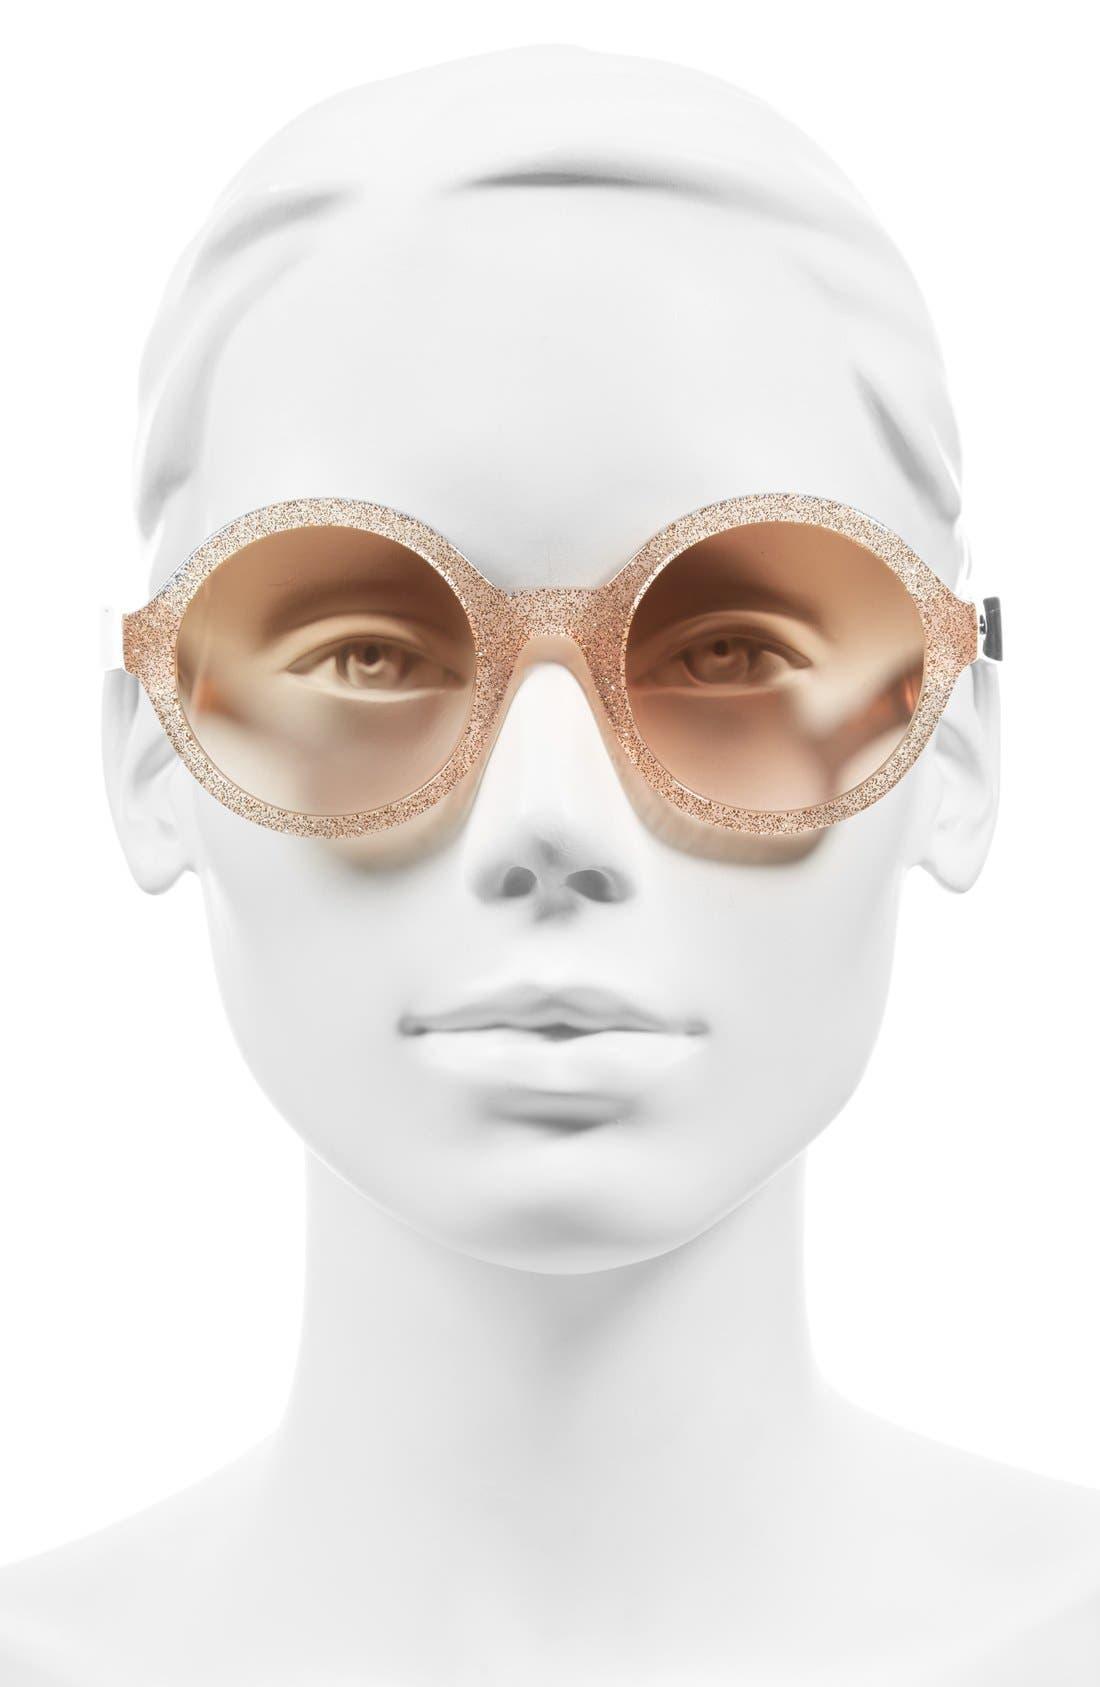 'khriss' 52mm round sunglasses,                             Alternate thumbnail 2, color,                             Pink/ Gold Glitter